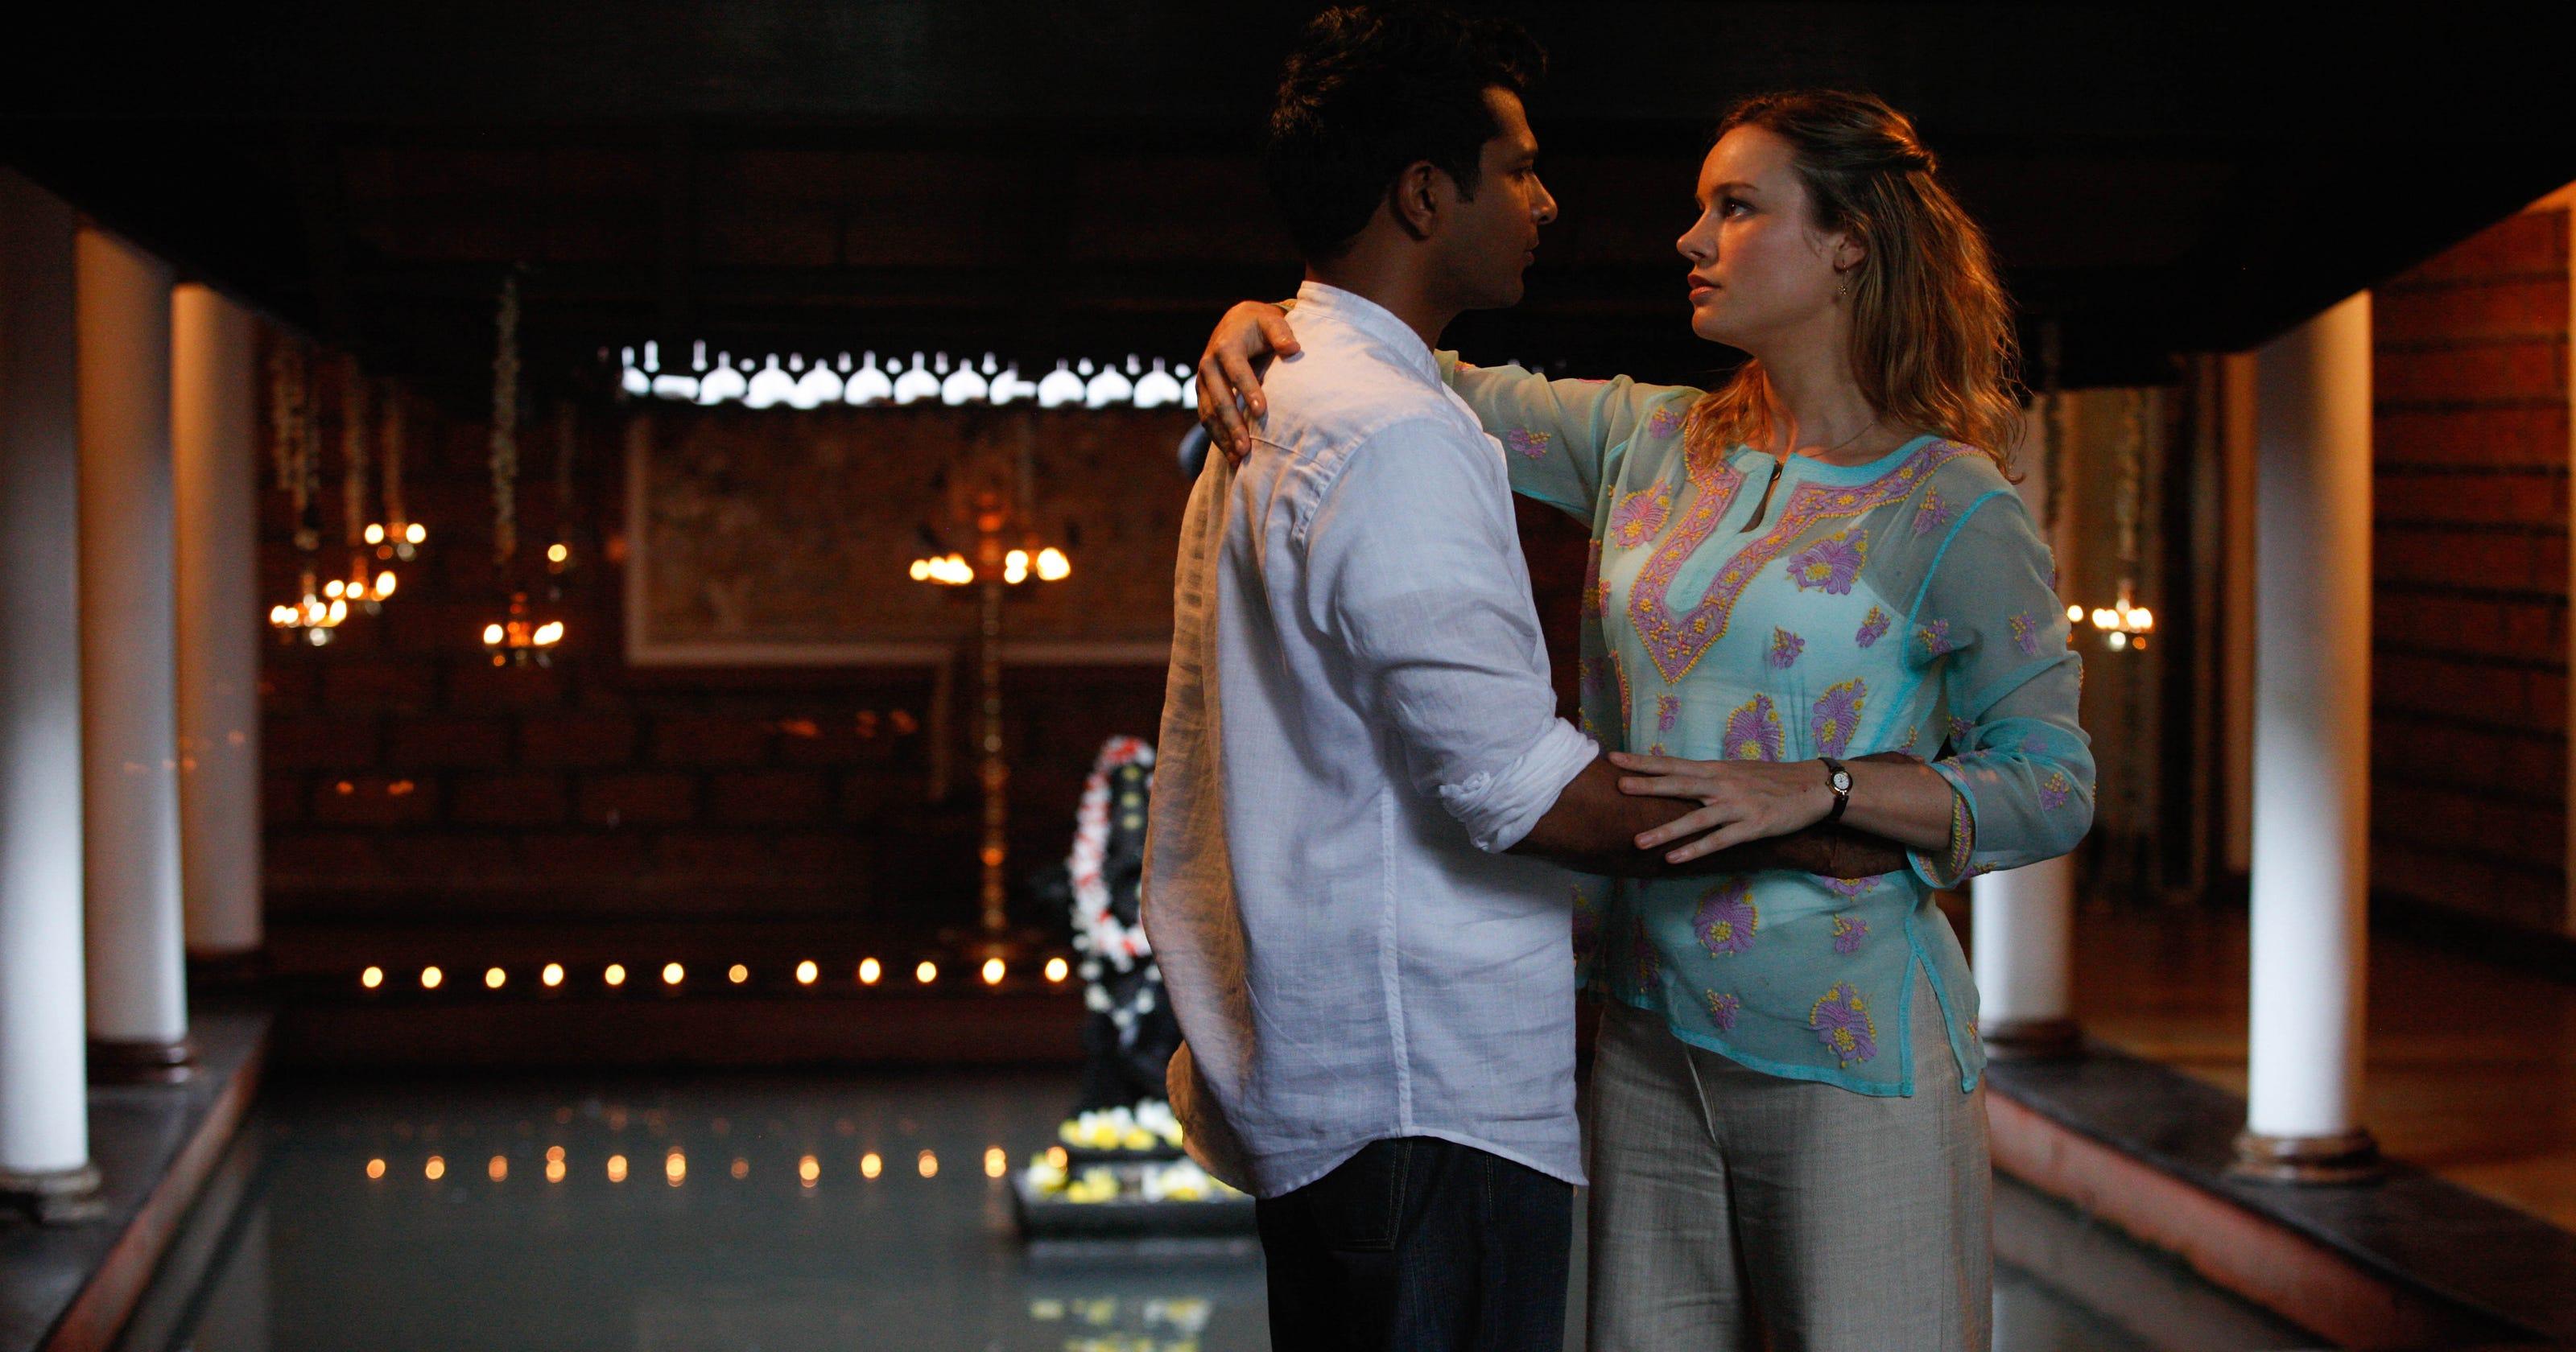 Hear Brie Larson singing in Bollywood musical rom-com